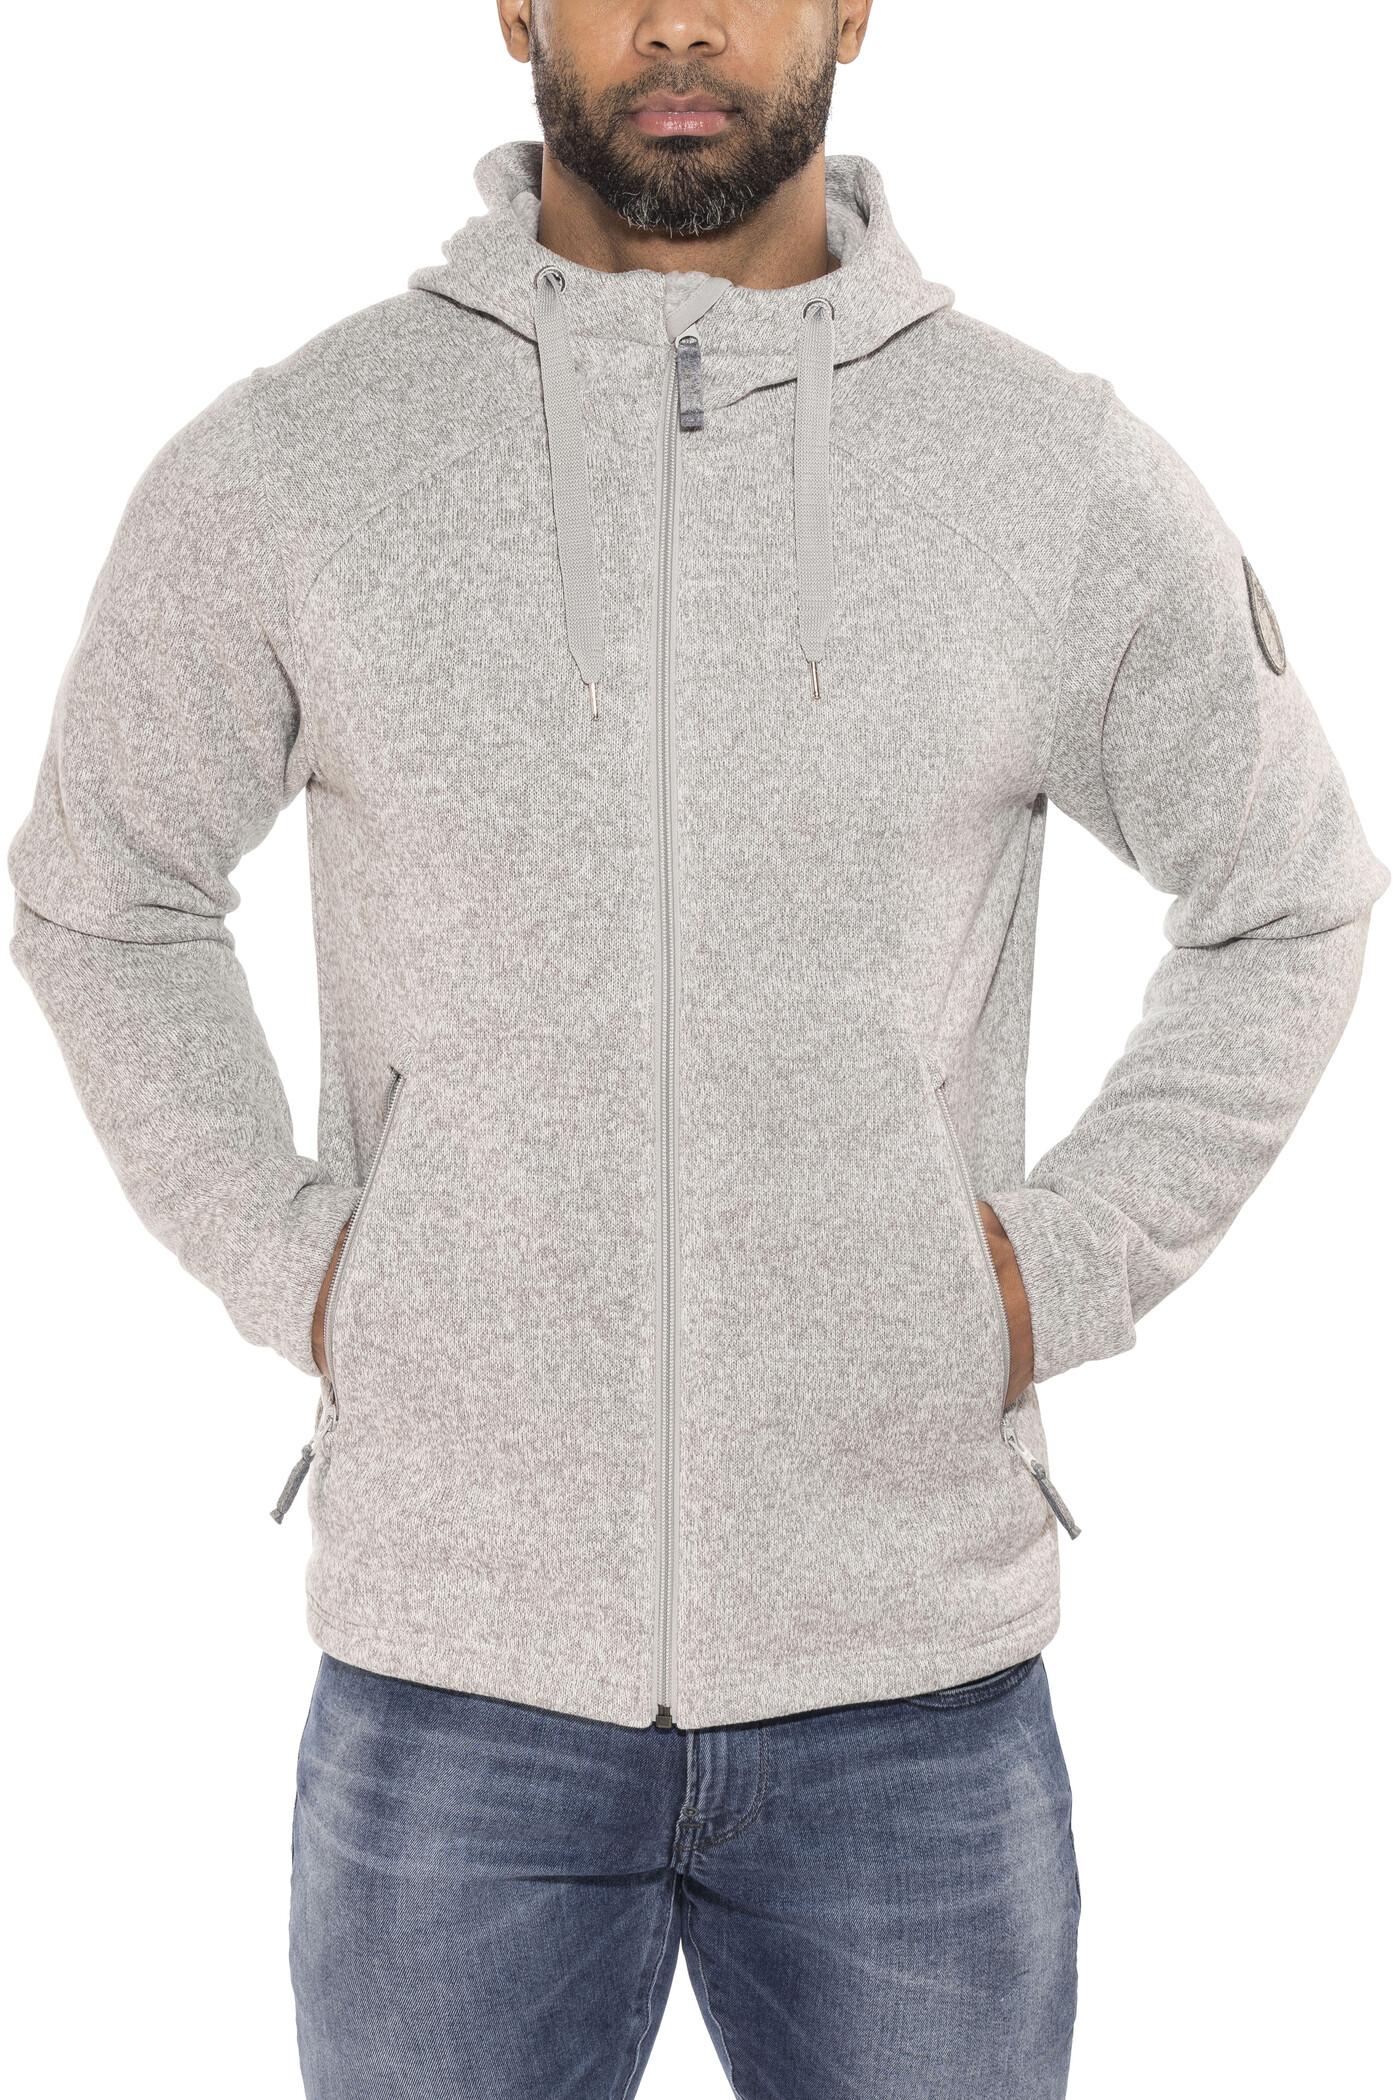 VAUDE Womens Tekoa Fleece Jacket Chaqueta Mujer